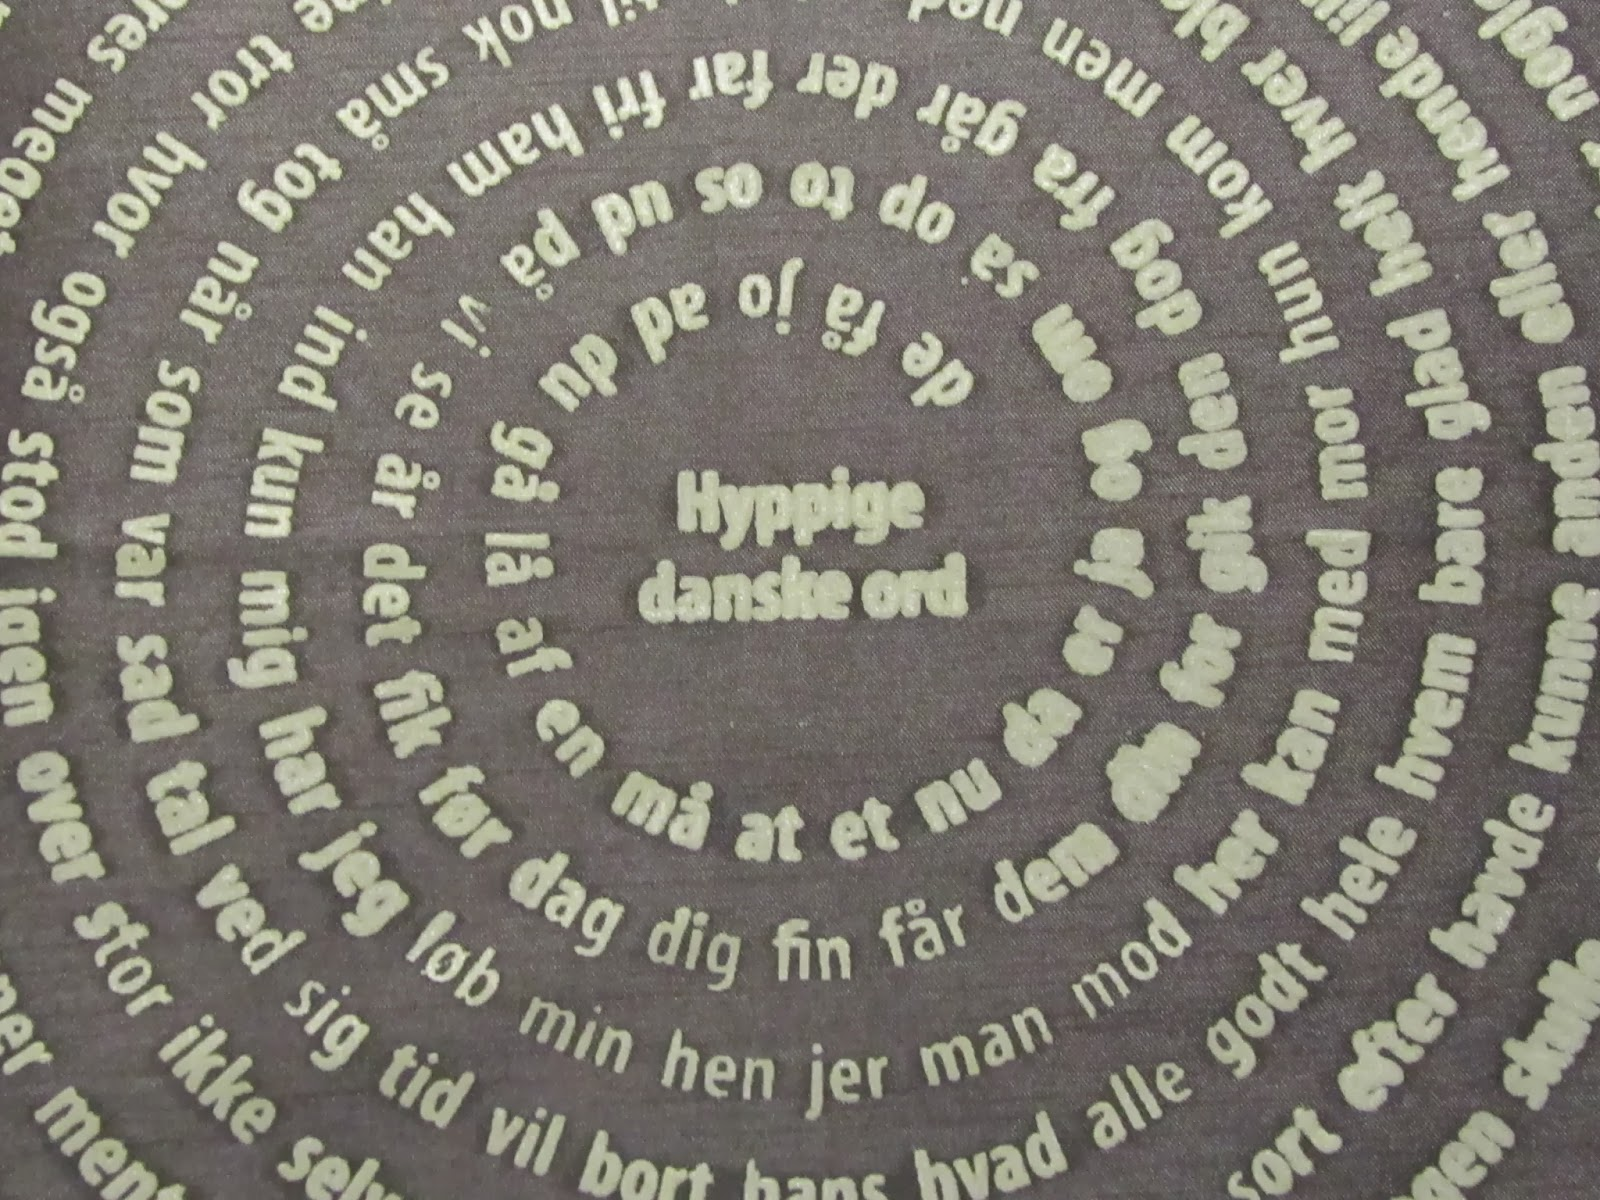 langt danske ord smukke kroppe